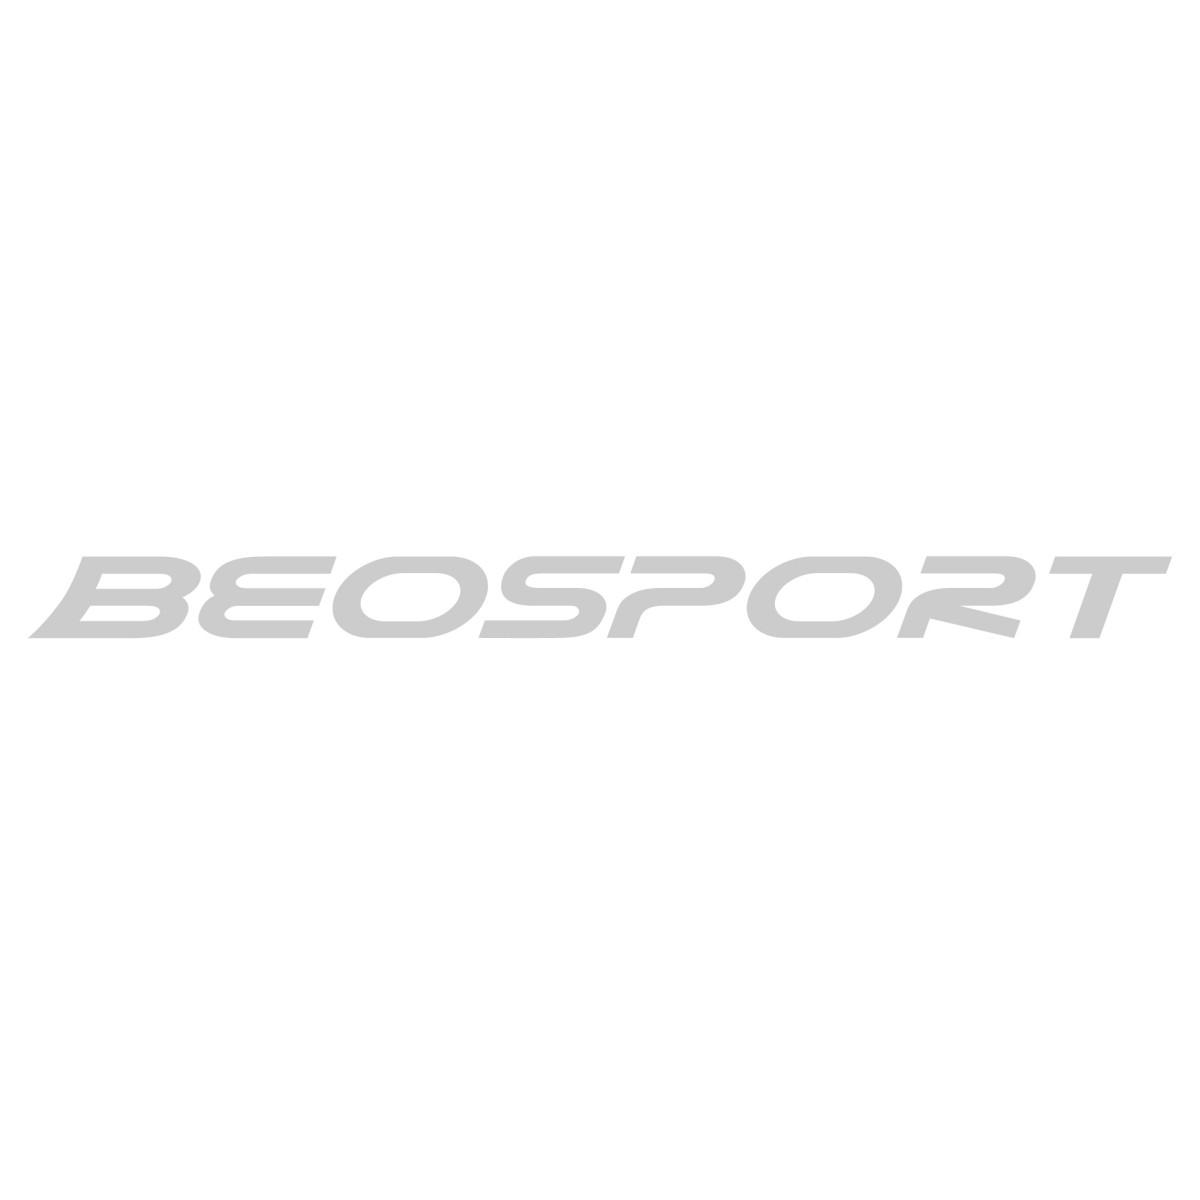 Skechers E - Ii Sandal - Beach Glower sandale